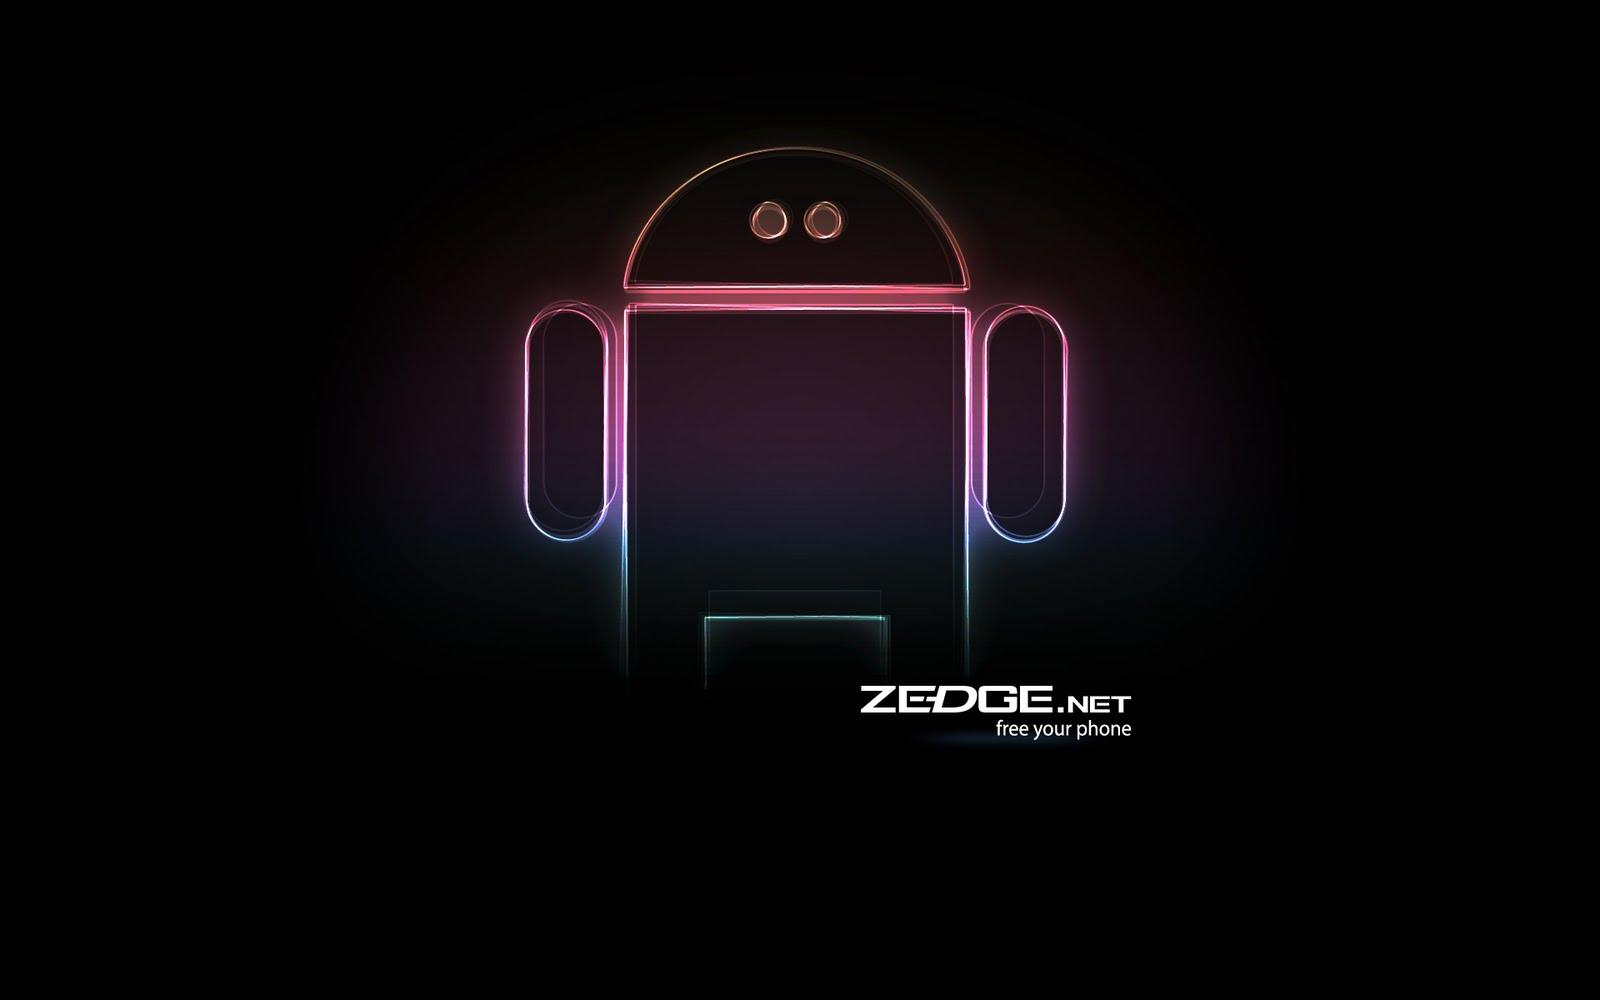 zedge free download ringtone